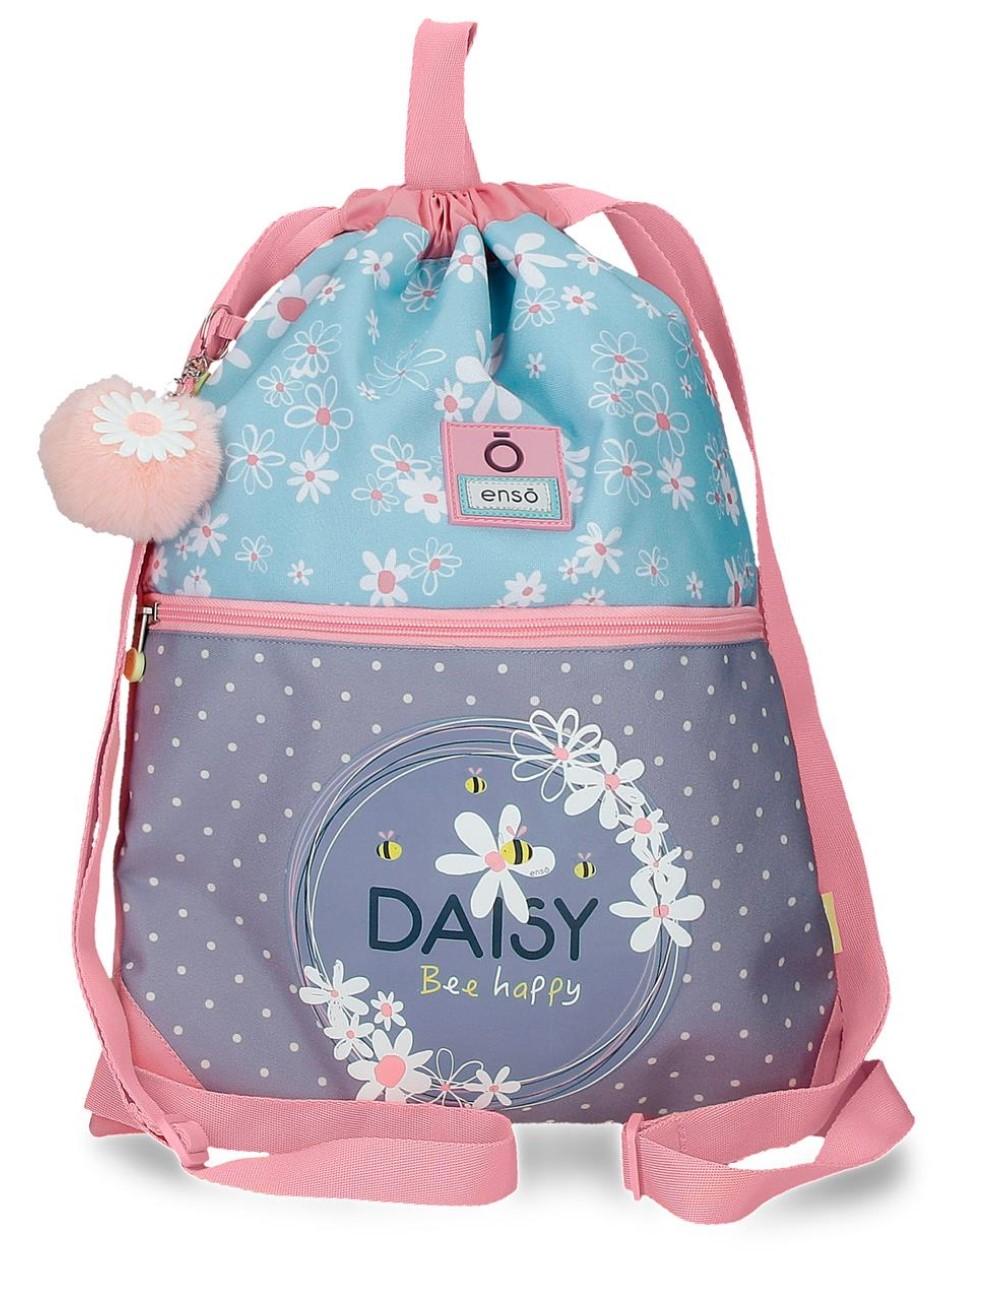 Gym Sac Enso Daisy Azul 9253821